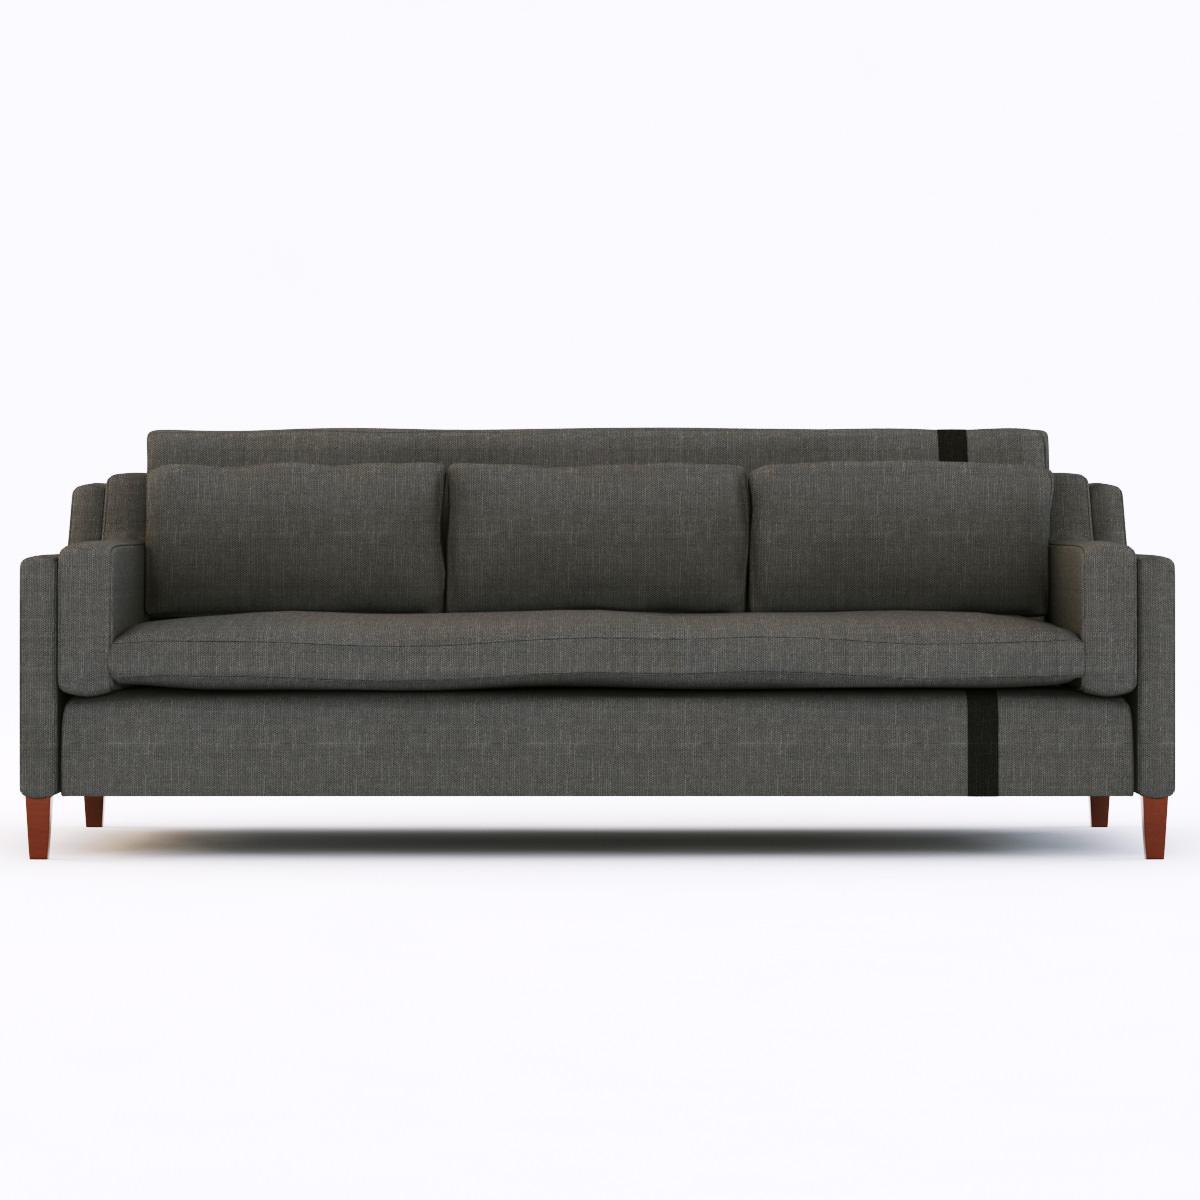 Modern sofa 8 3d models for Sofa bed 3d model